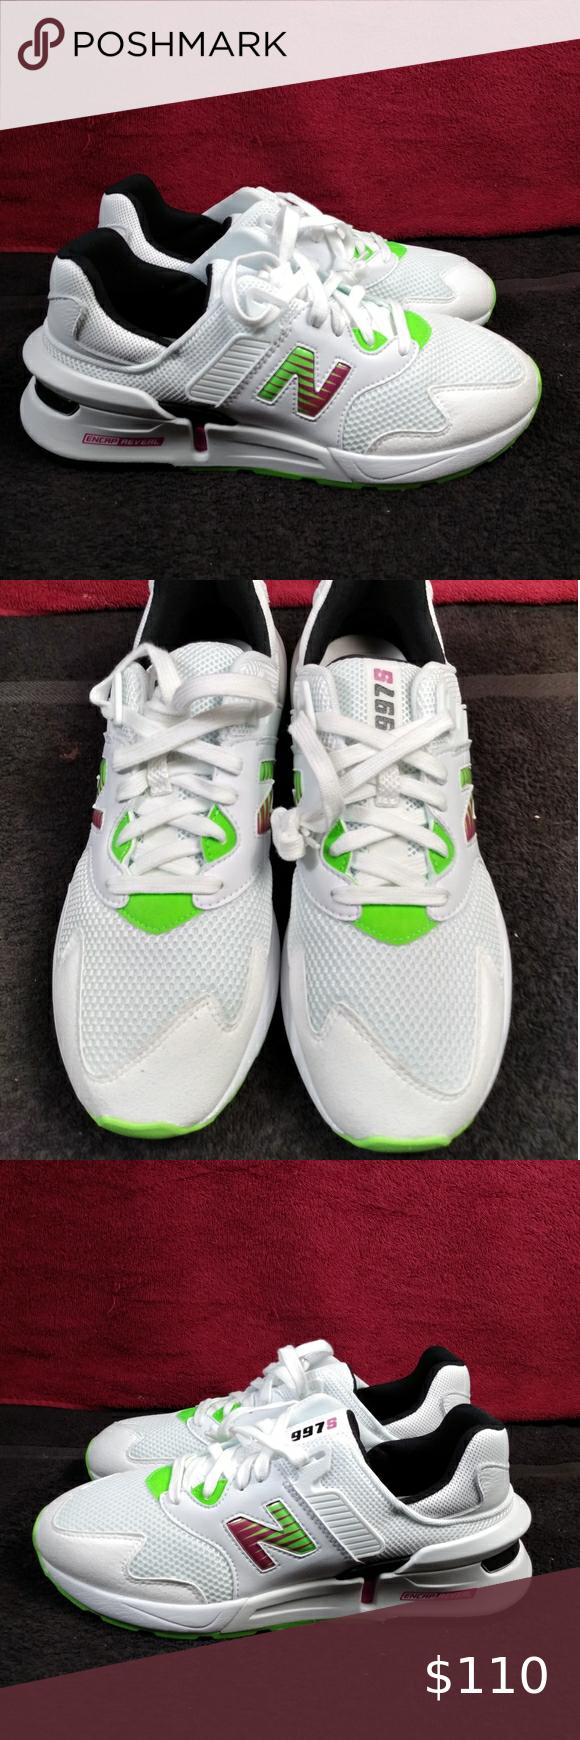 New Balance 997s X Kawhi Leonard Shoes Men S Sz 9 In 2020 Shoes Mens Shoes New Balance Shoes